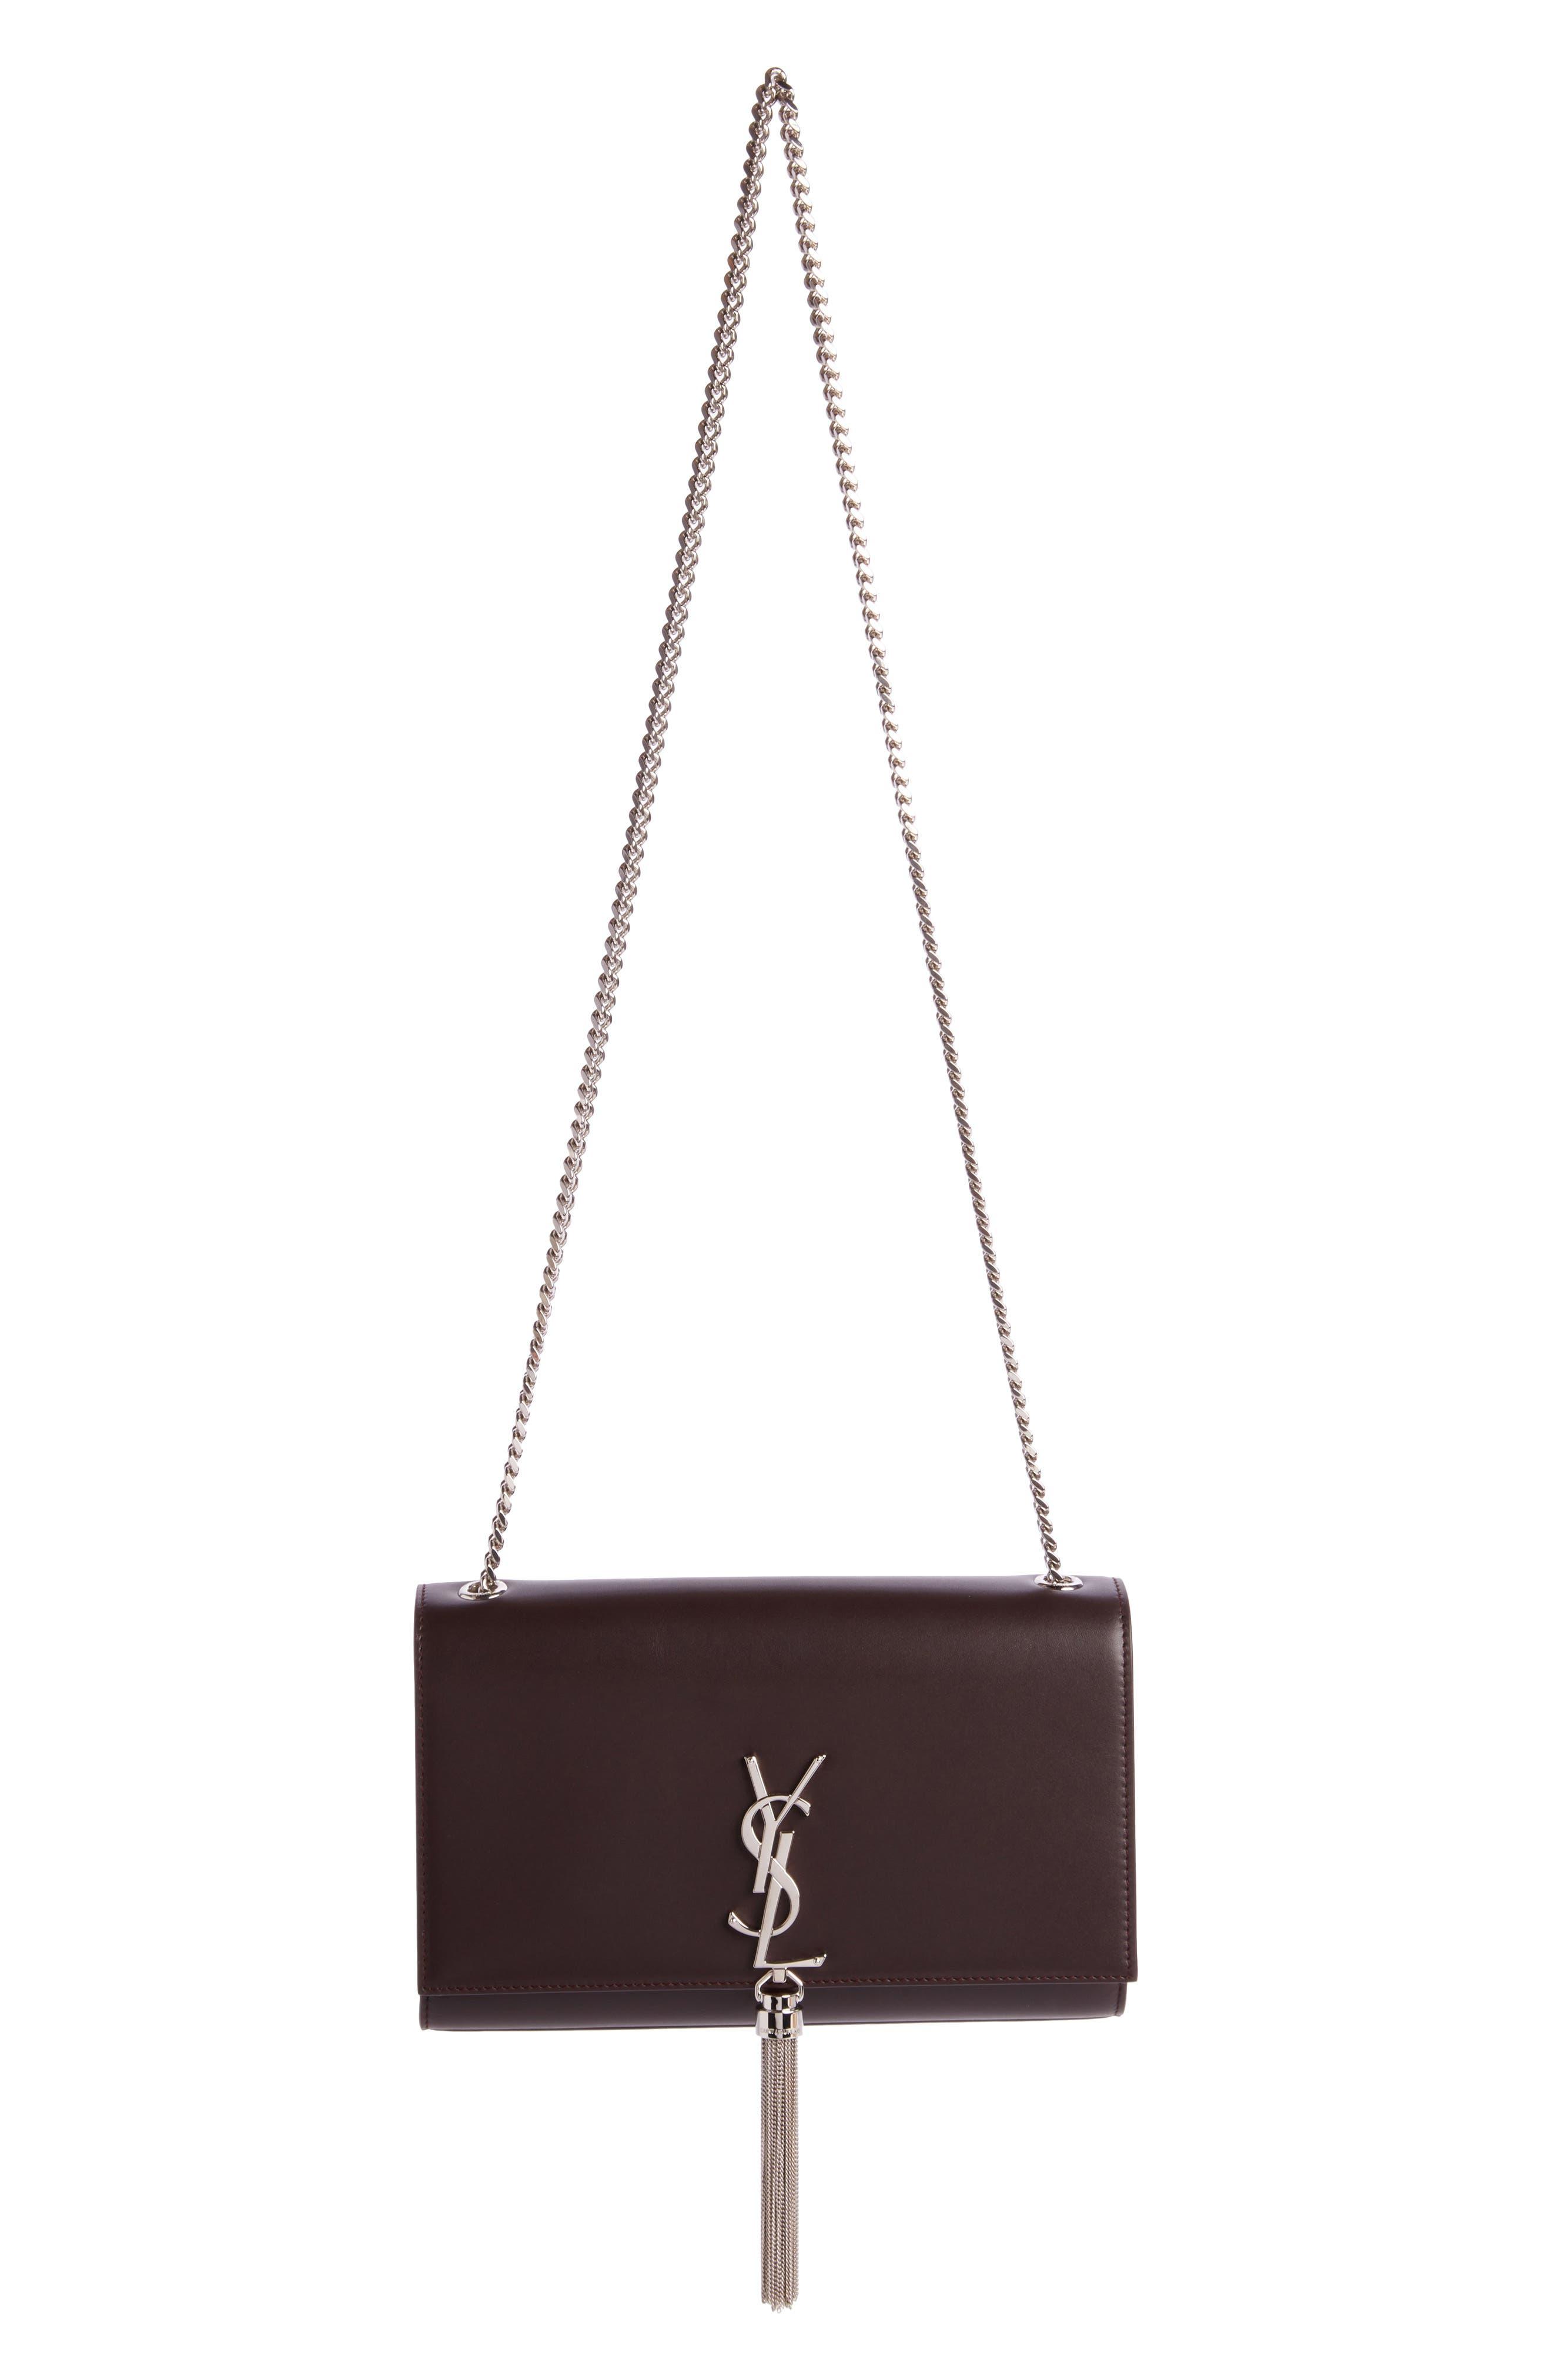 Saint Laurent Medium Kate - Tassel Calfskin Leather Shoulder Bag